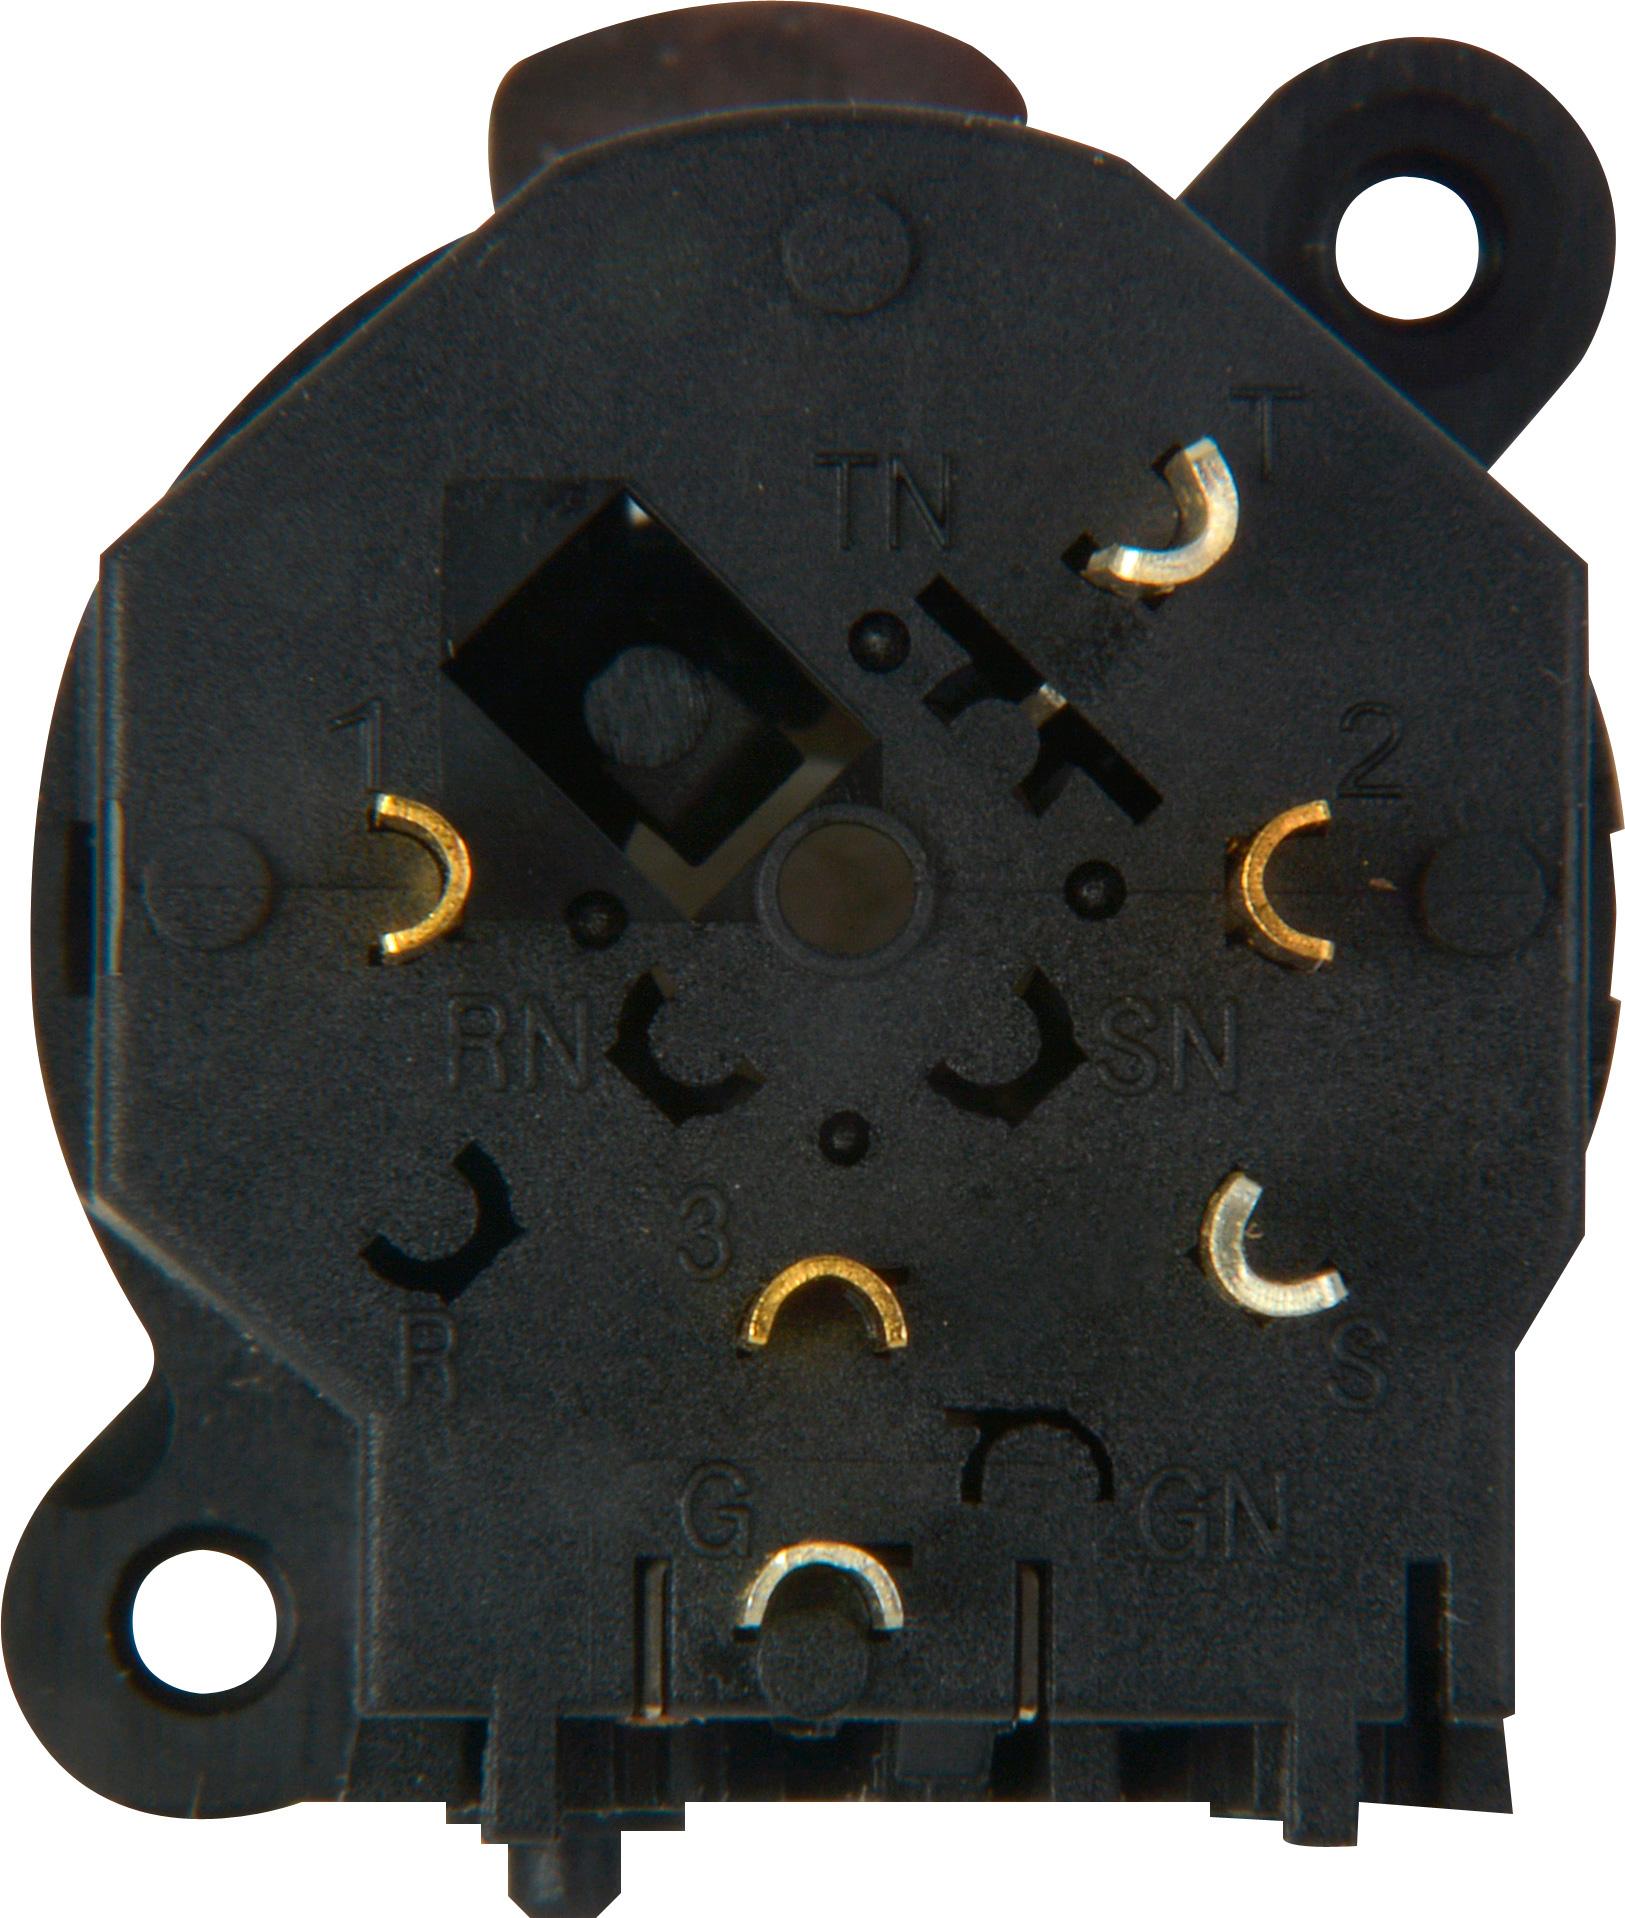 neutrik jack wiring neutrik image wiring diagram neutrik ncj5fi s combo mono 3 pin xlrf 1 4 inch jack chassis on neutrik jack